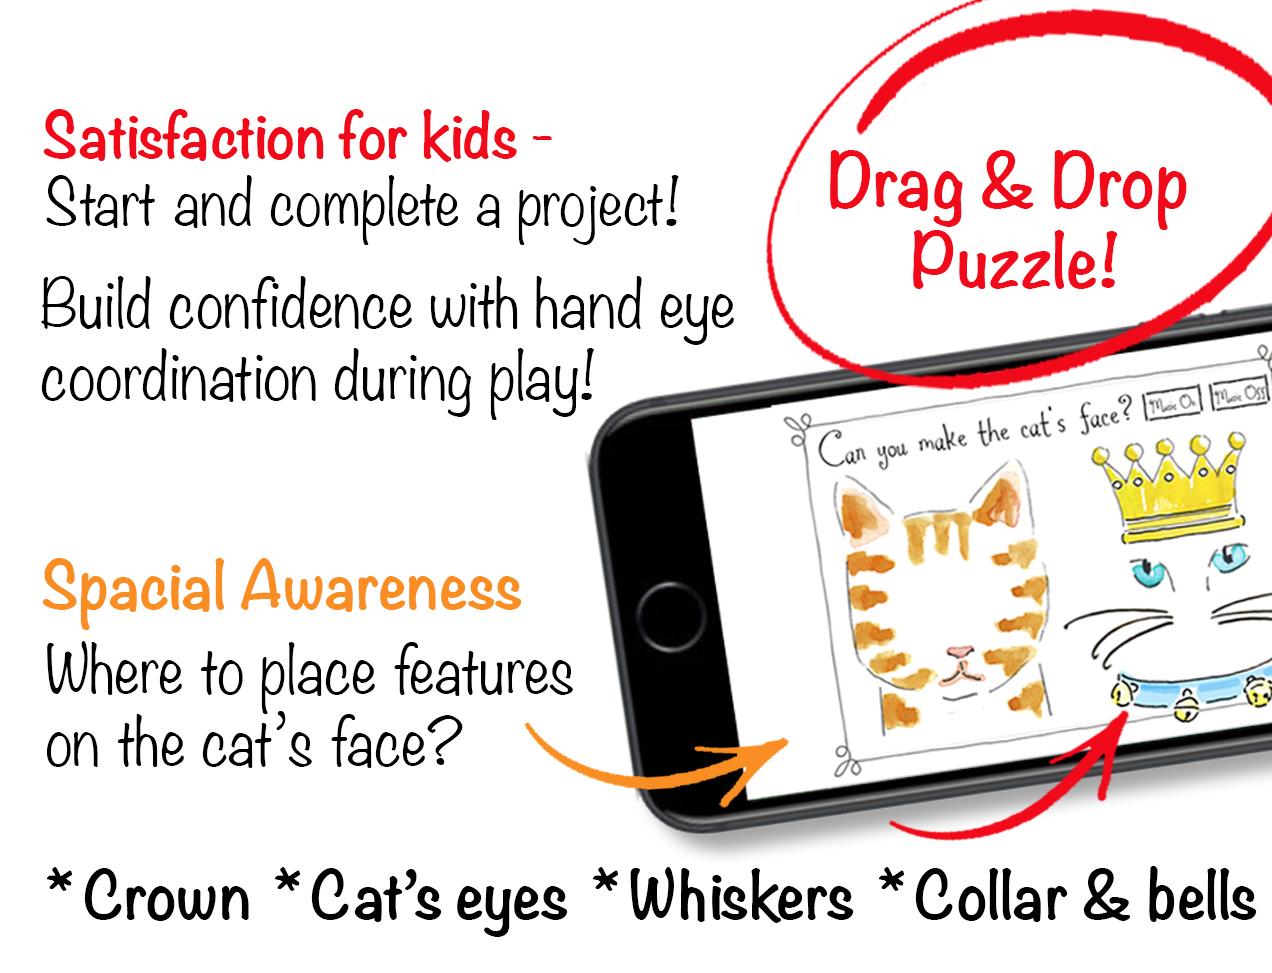 drag-&-drop-iphone-spatial-awareness-lindybelinda-Apple-apps-half.jpg